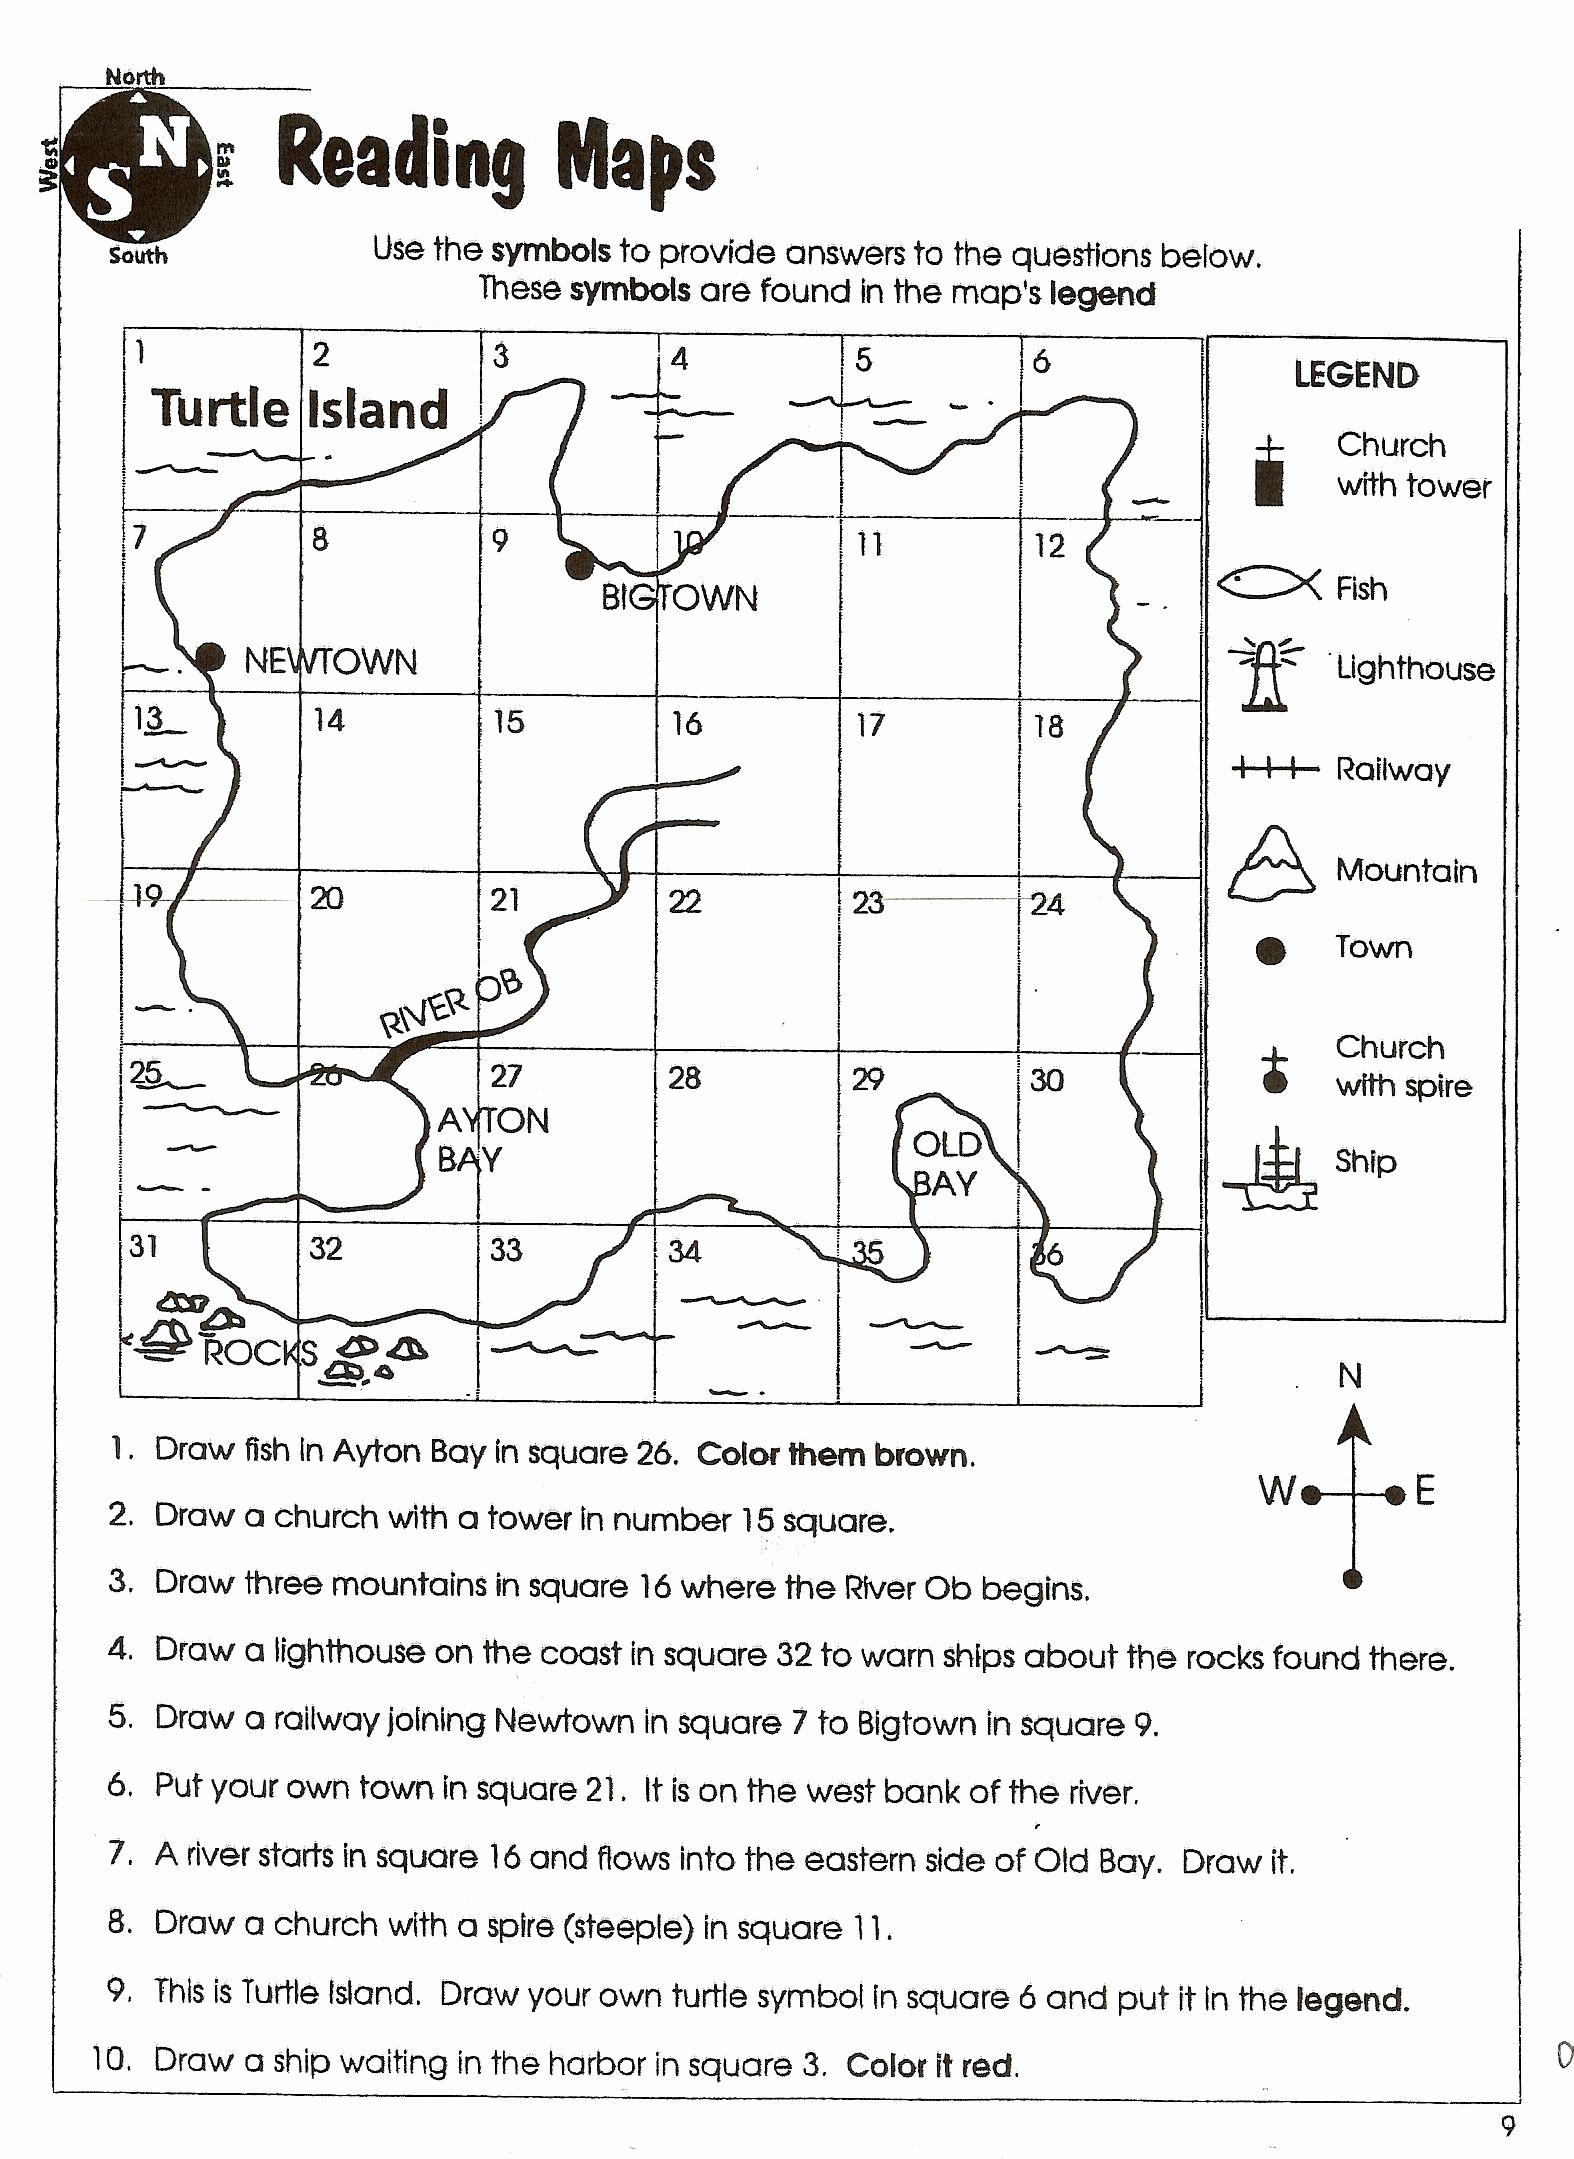 4th Grade Map Skills Worksheets Fresh 10 Inspirational Printable Map Skills Worksheets for 4th